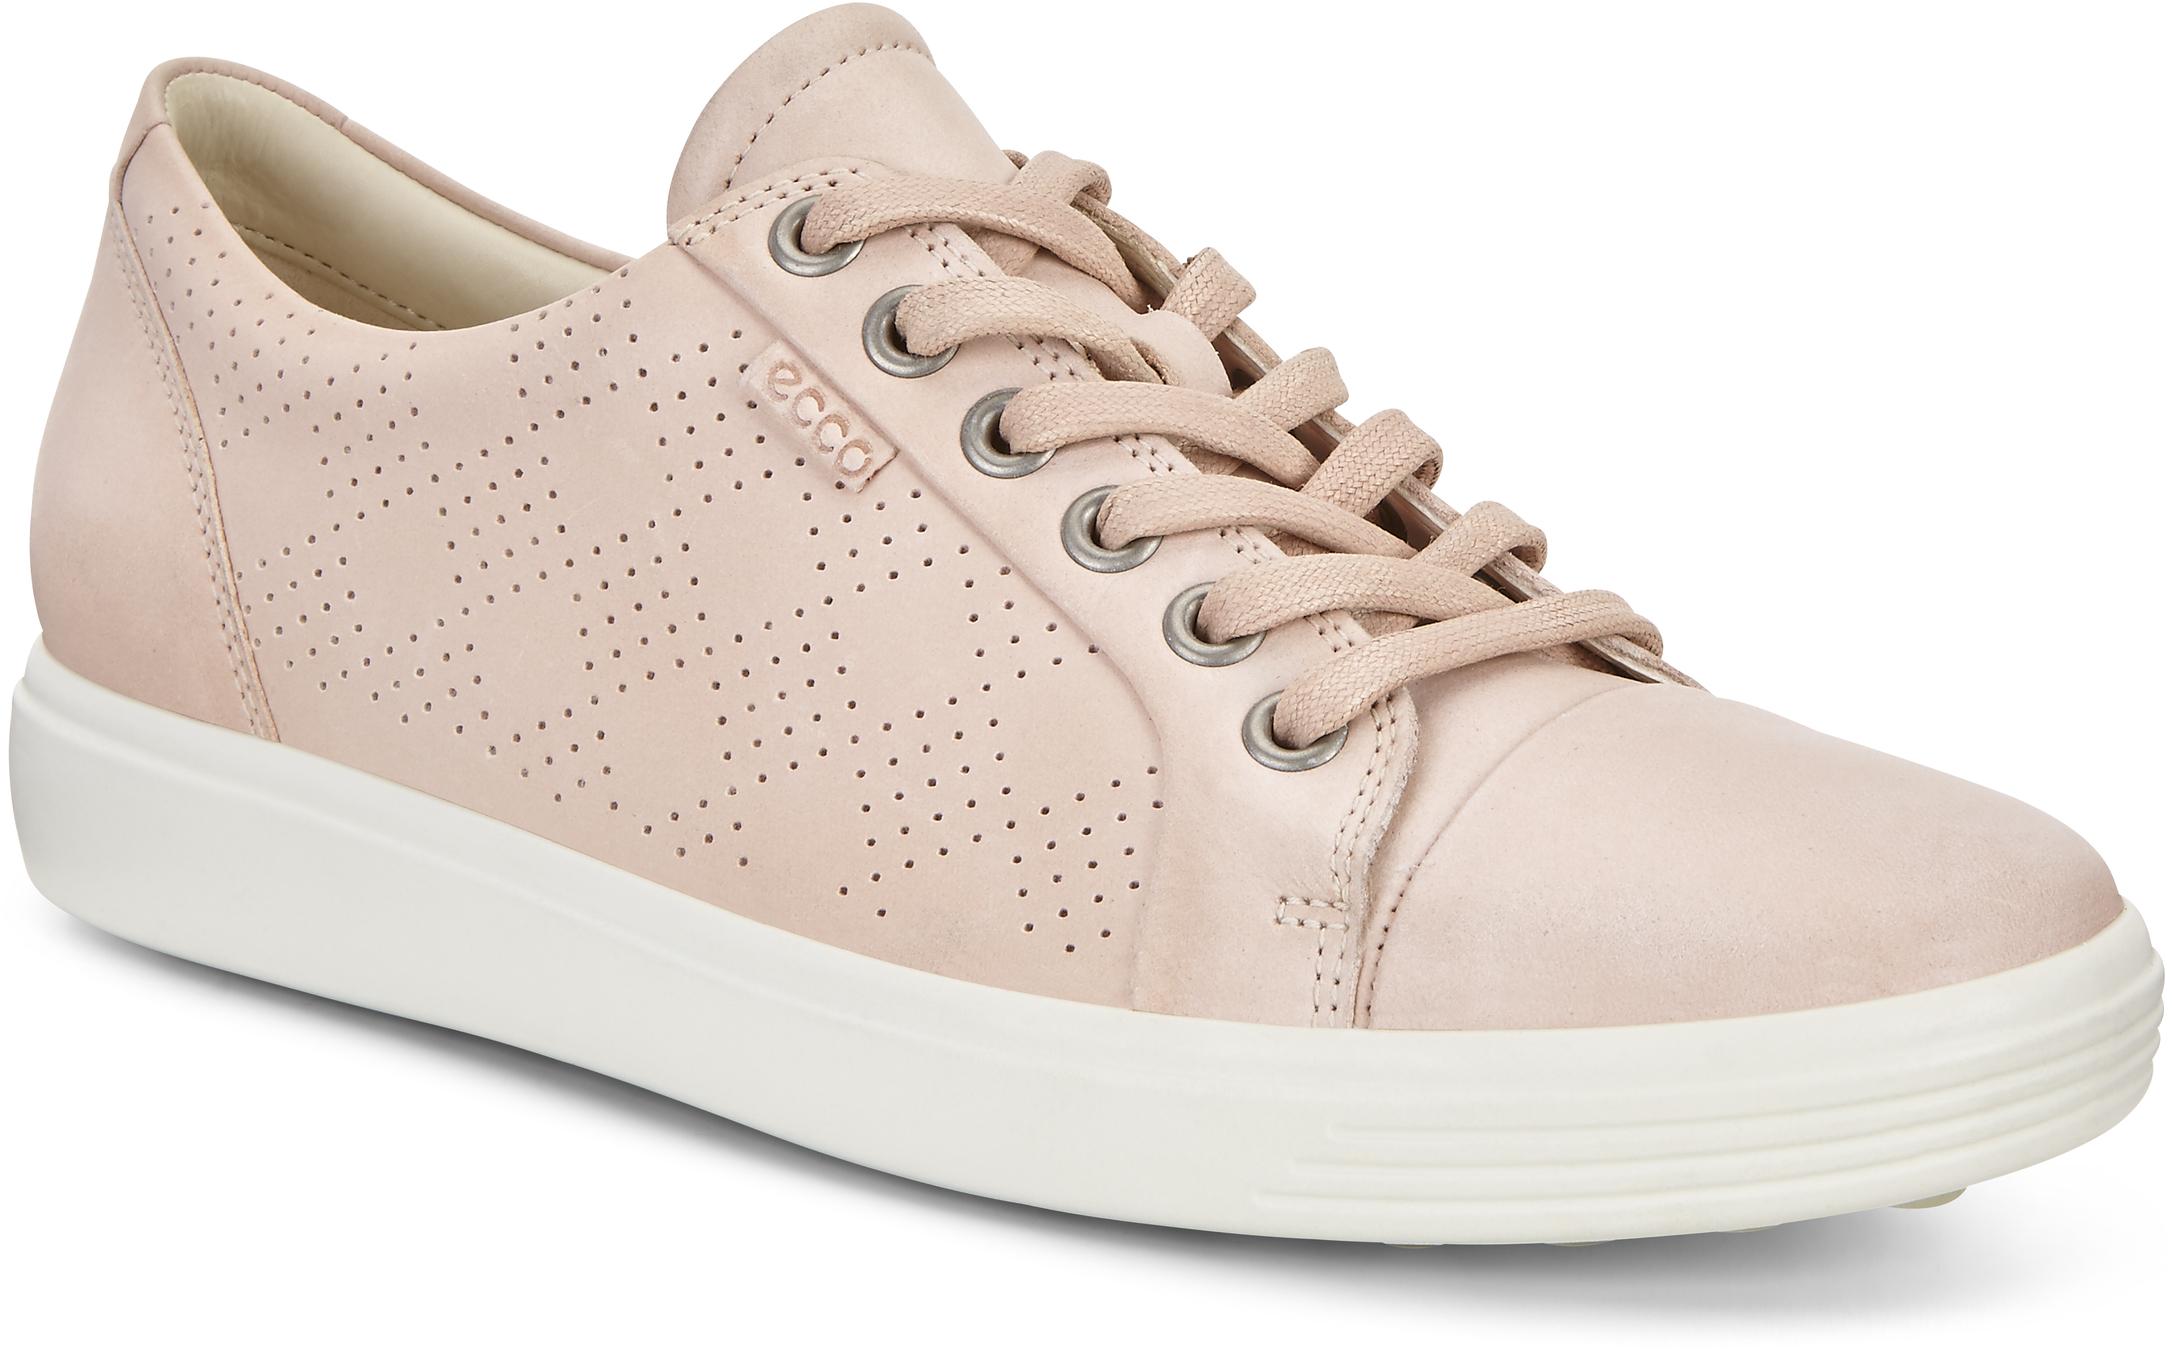 Ecco Ecco OffroadShoes OffroadShoes OffroadShoes Ecco OffroadShoes HommeGris1 HommeGris1 HommeGris1 Ecco nP8kO0w